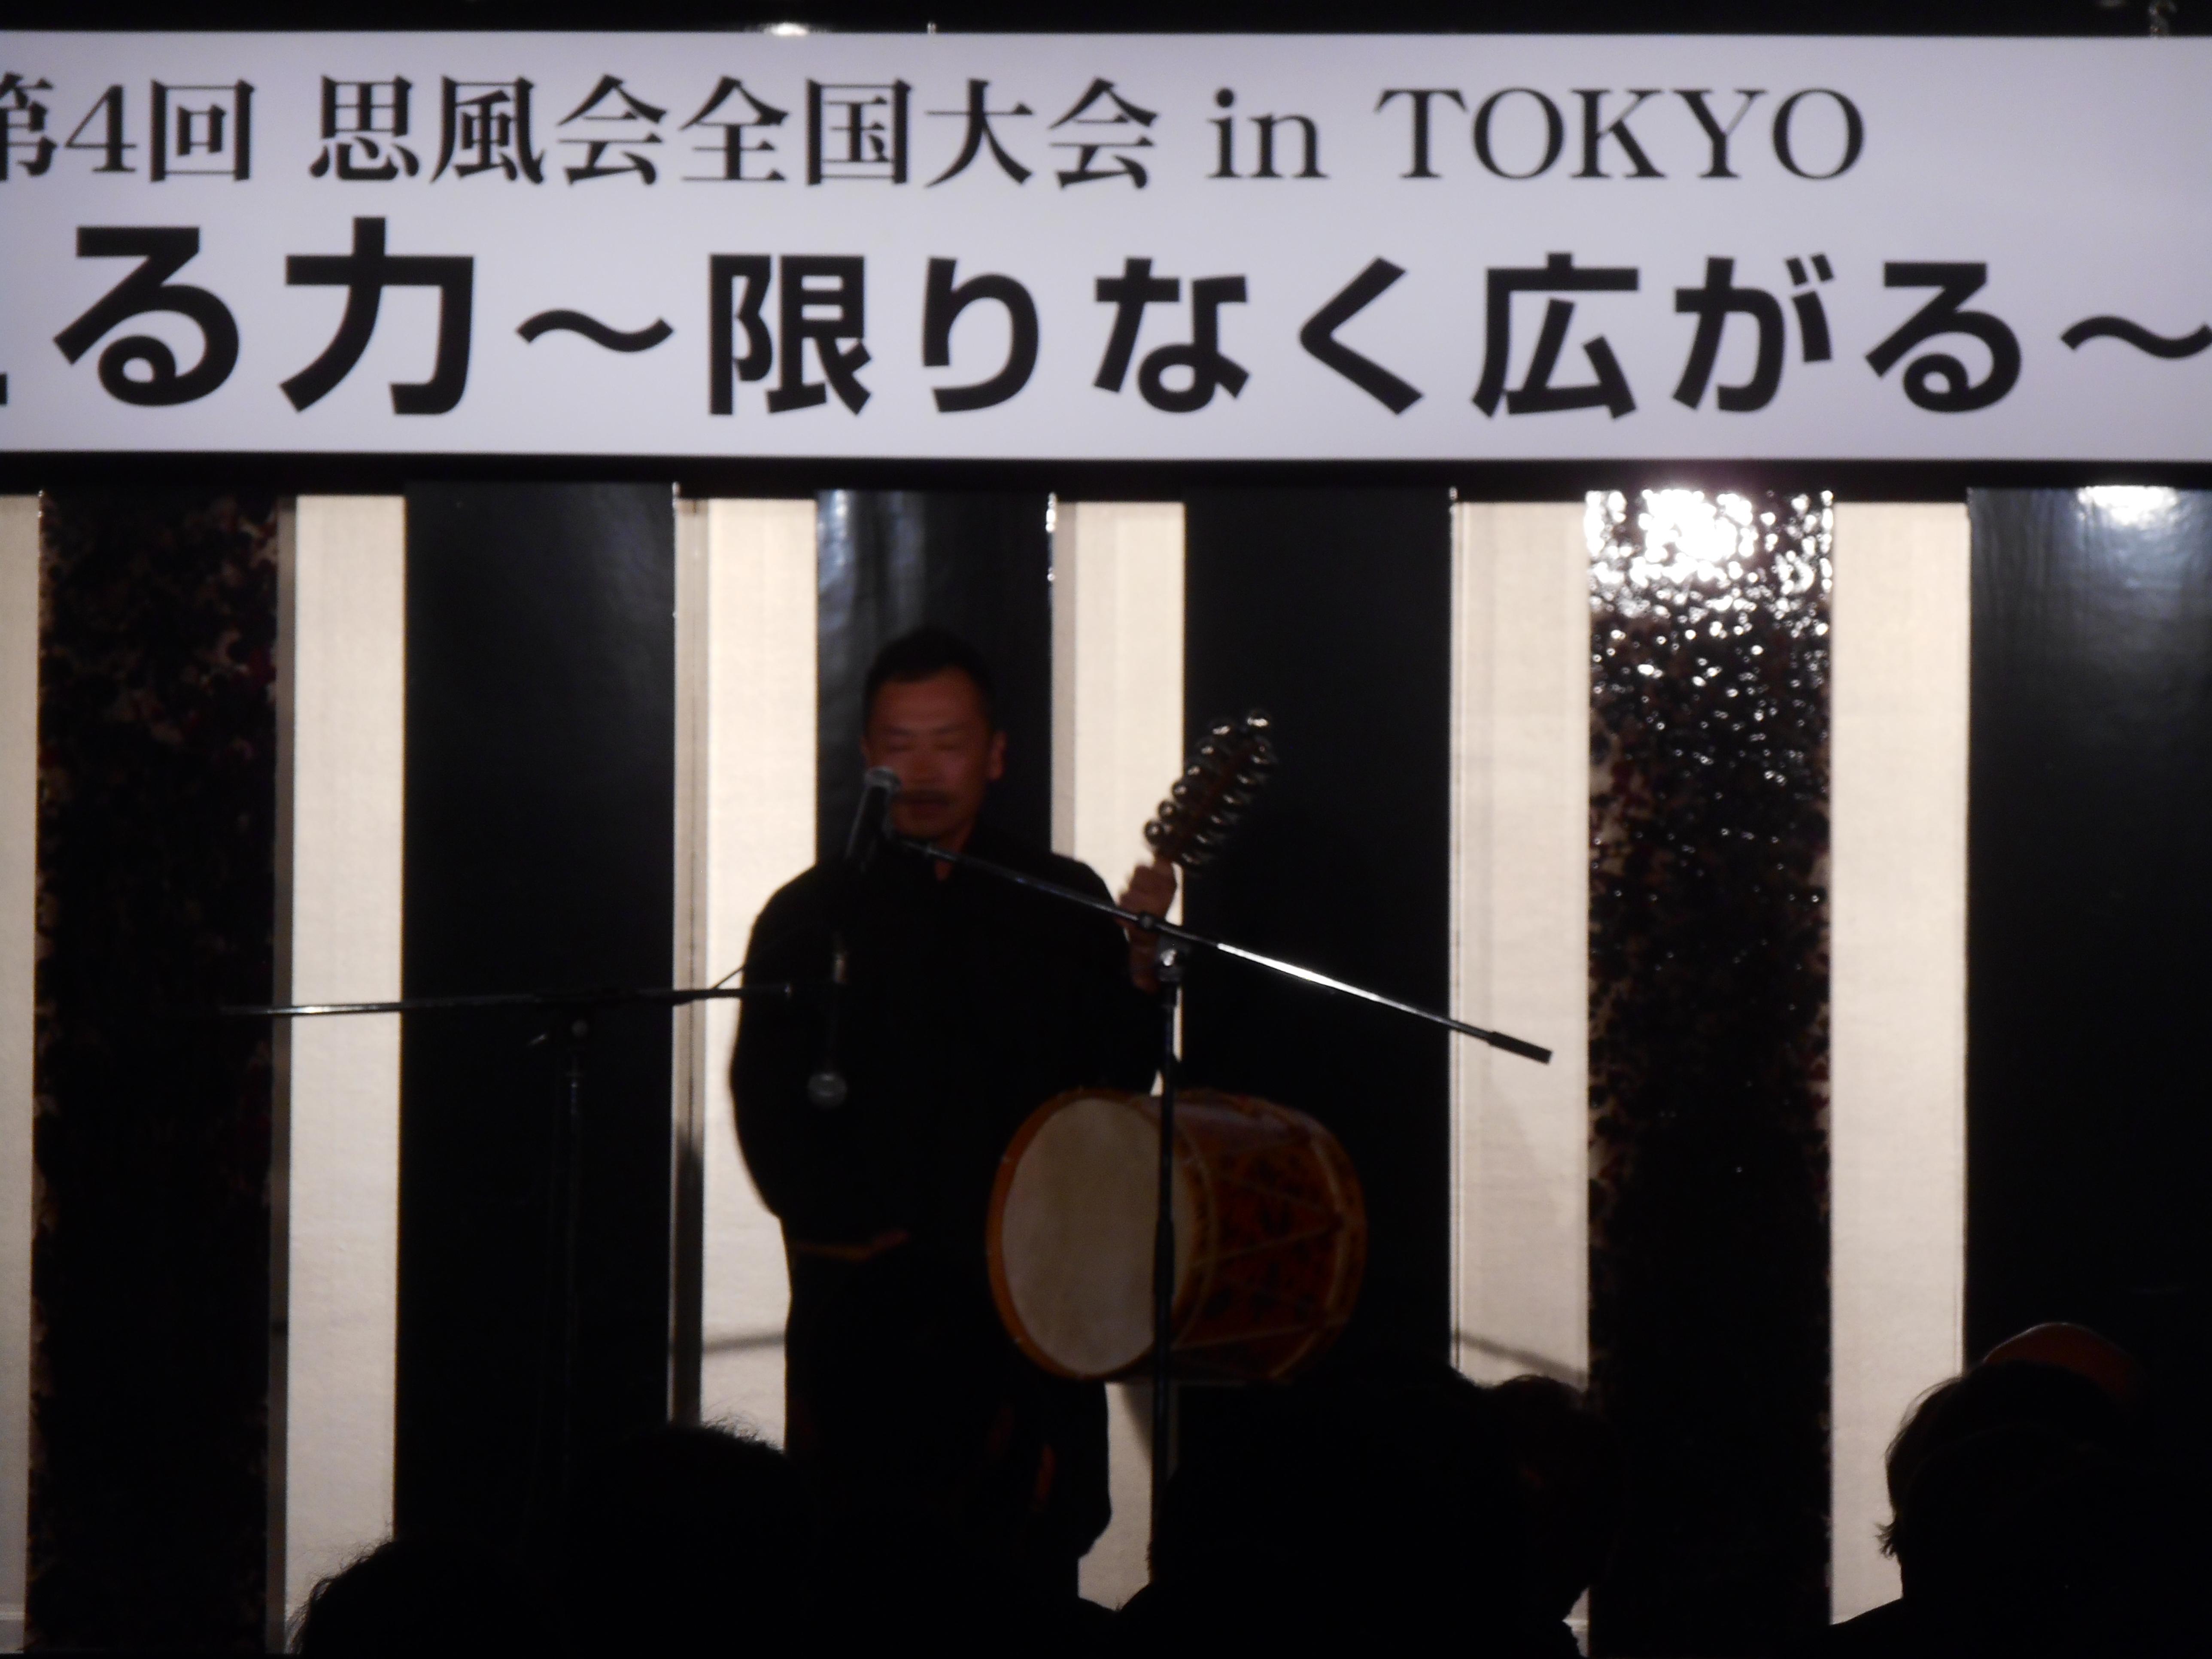 DSCN2050 - 平成30年度 東京思風塾 4月7日(土)「時代が問題をつくり、問題が人物をつくる」